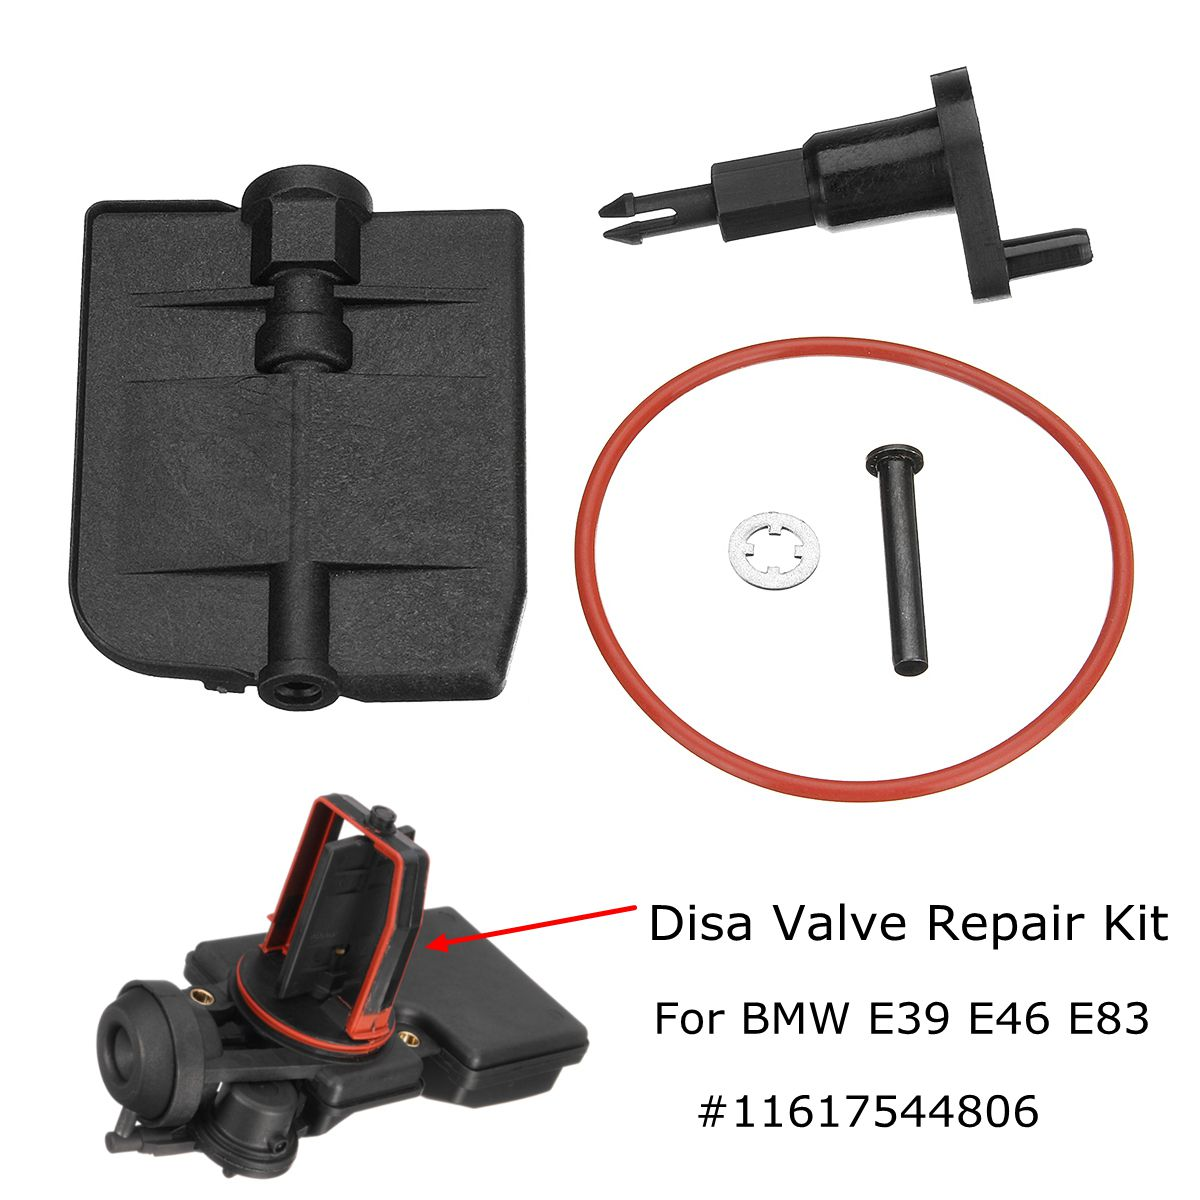 Emme manifoldu DISA valf tamir kiti 11617544806 BMW için E39 E46 E83 325i 525i M54 2.5 2001-2006